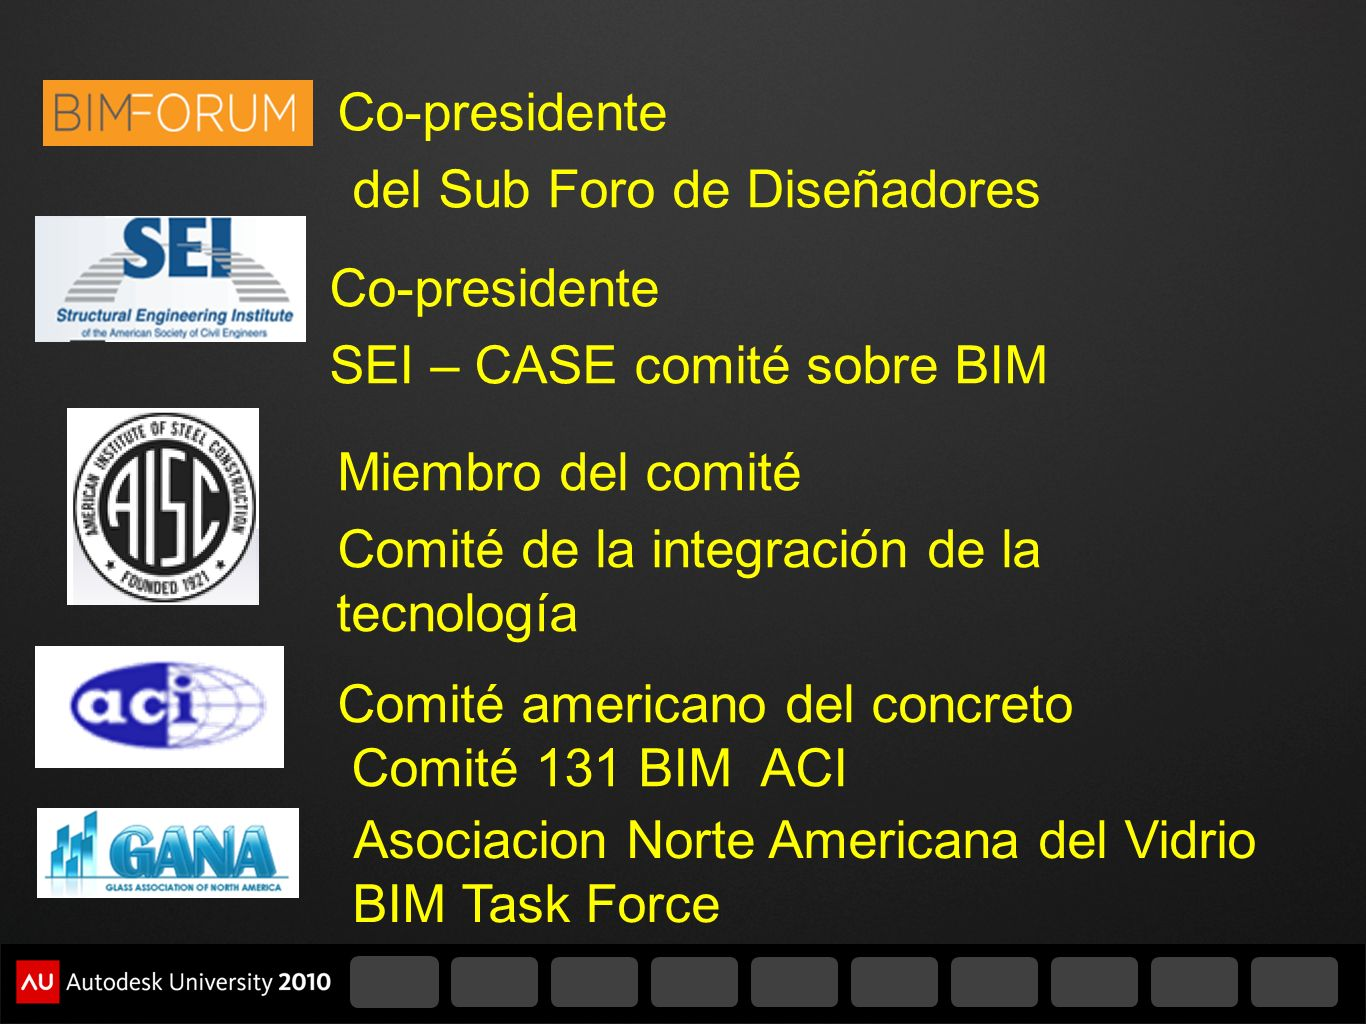 Co-presidente SEI – CASE comité sobre BIM Co-presidente del Sub Foro de Diseñadores Miembro del comité Comité de la integración de la tecnología Comit